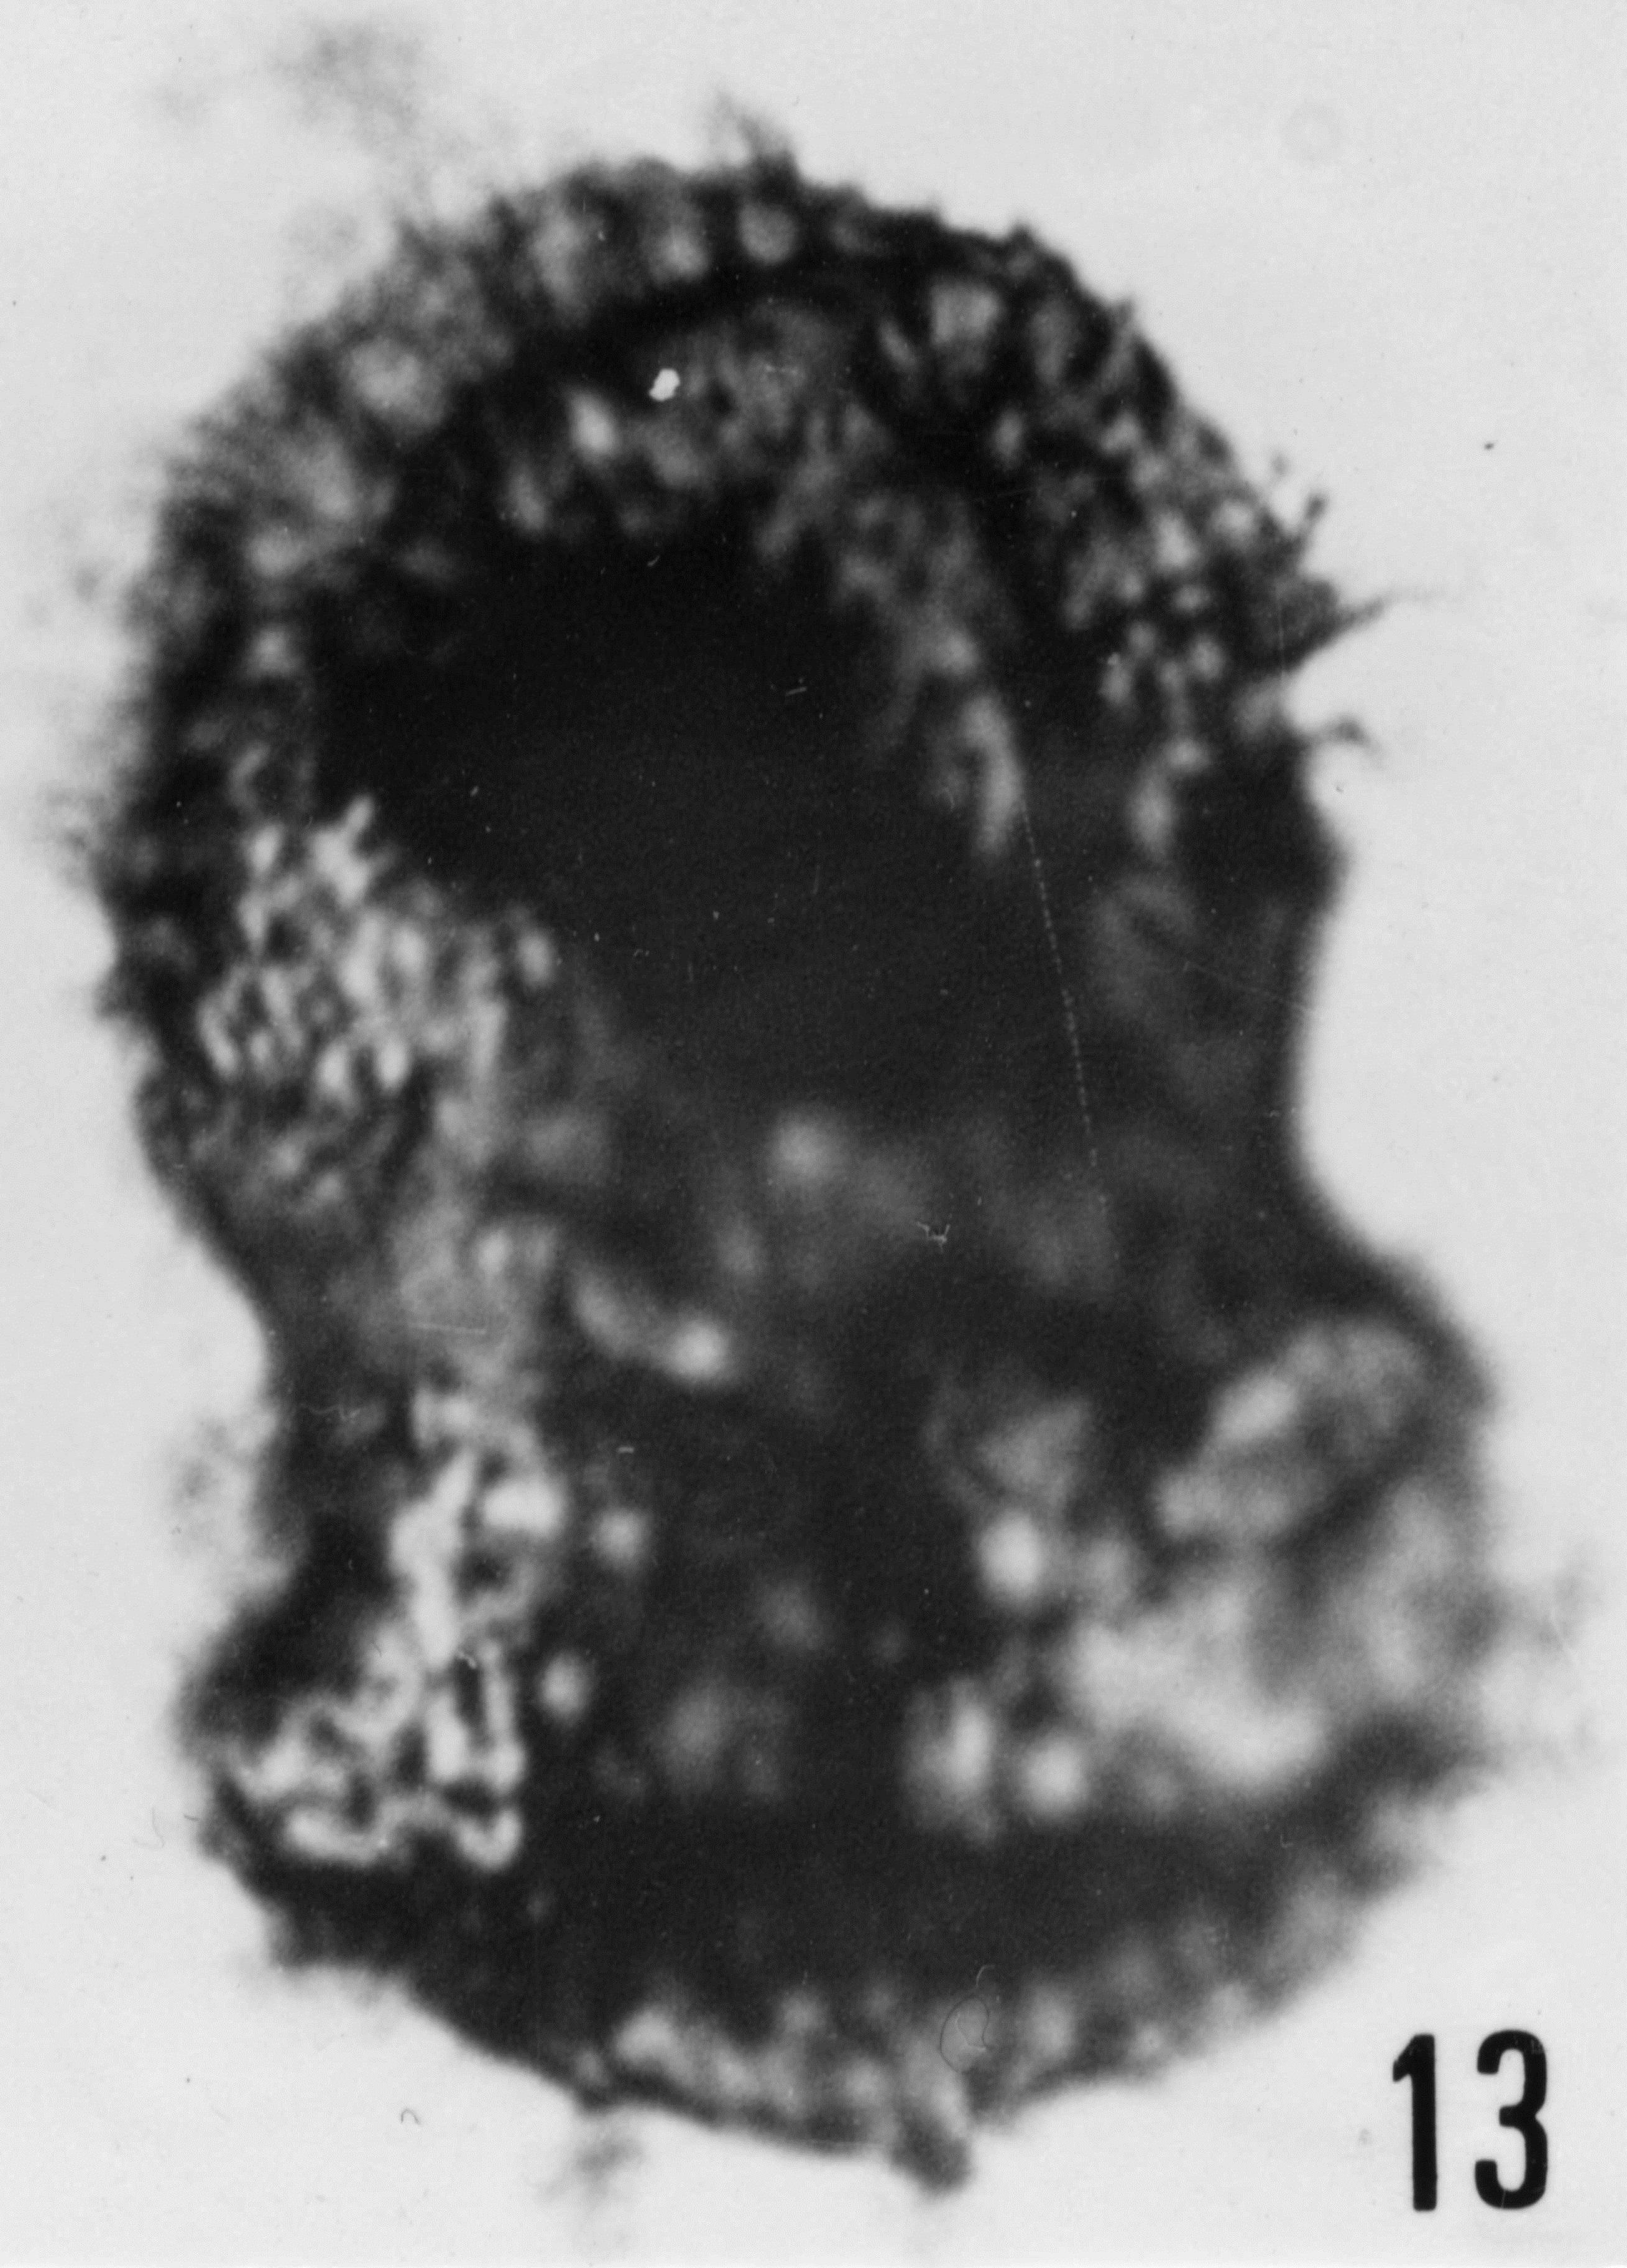 Fig. 13 - Acanthodiacrodium papillare Timofeev, B. V., 1959. CHE-25. I. R. Sc. N. B. No b505.